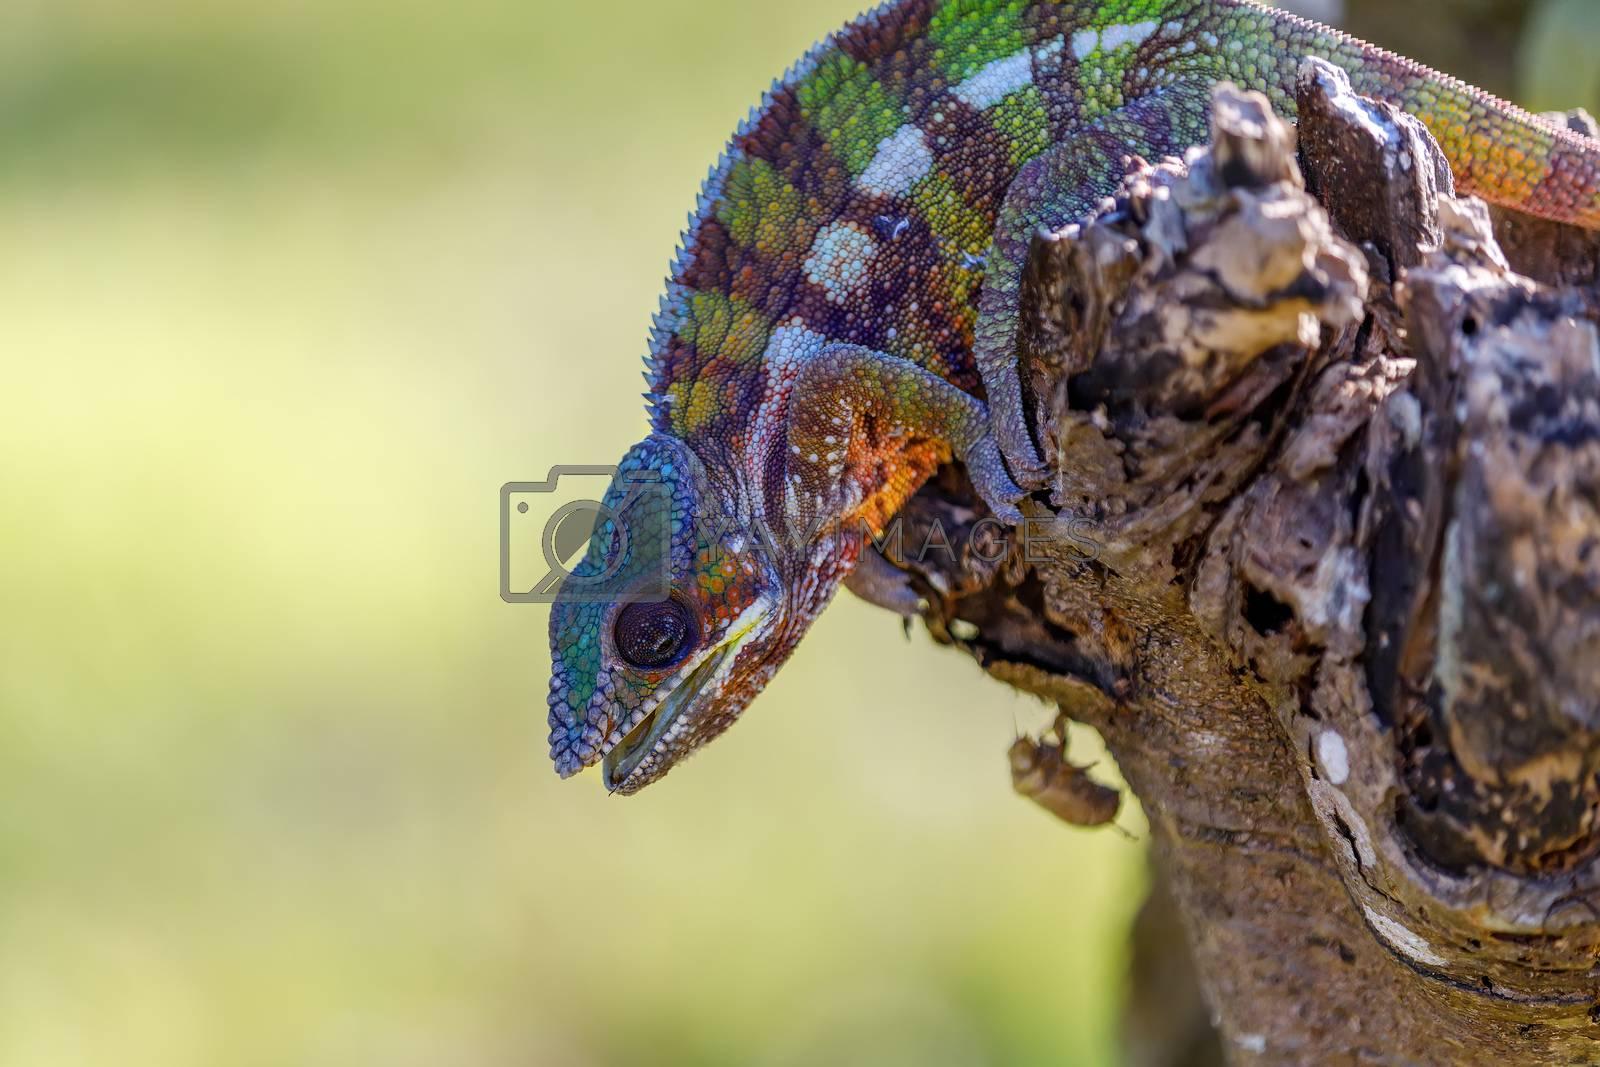 panther chameleon, Furcifer pardalis in natural habitat in rainforest at Masoala national park forest, Toamasina Province, Madagascar wildlife.